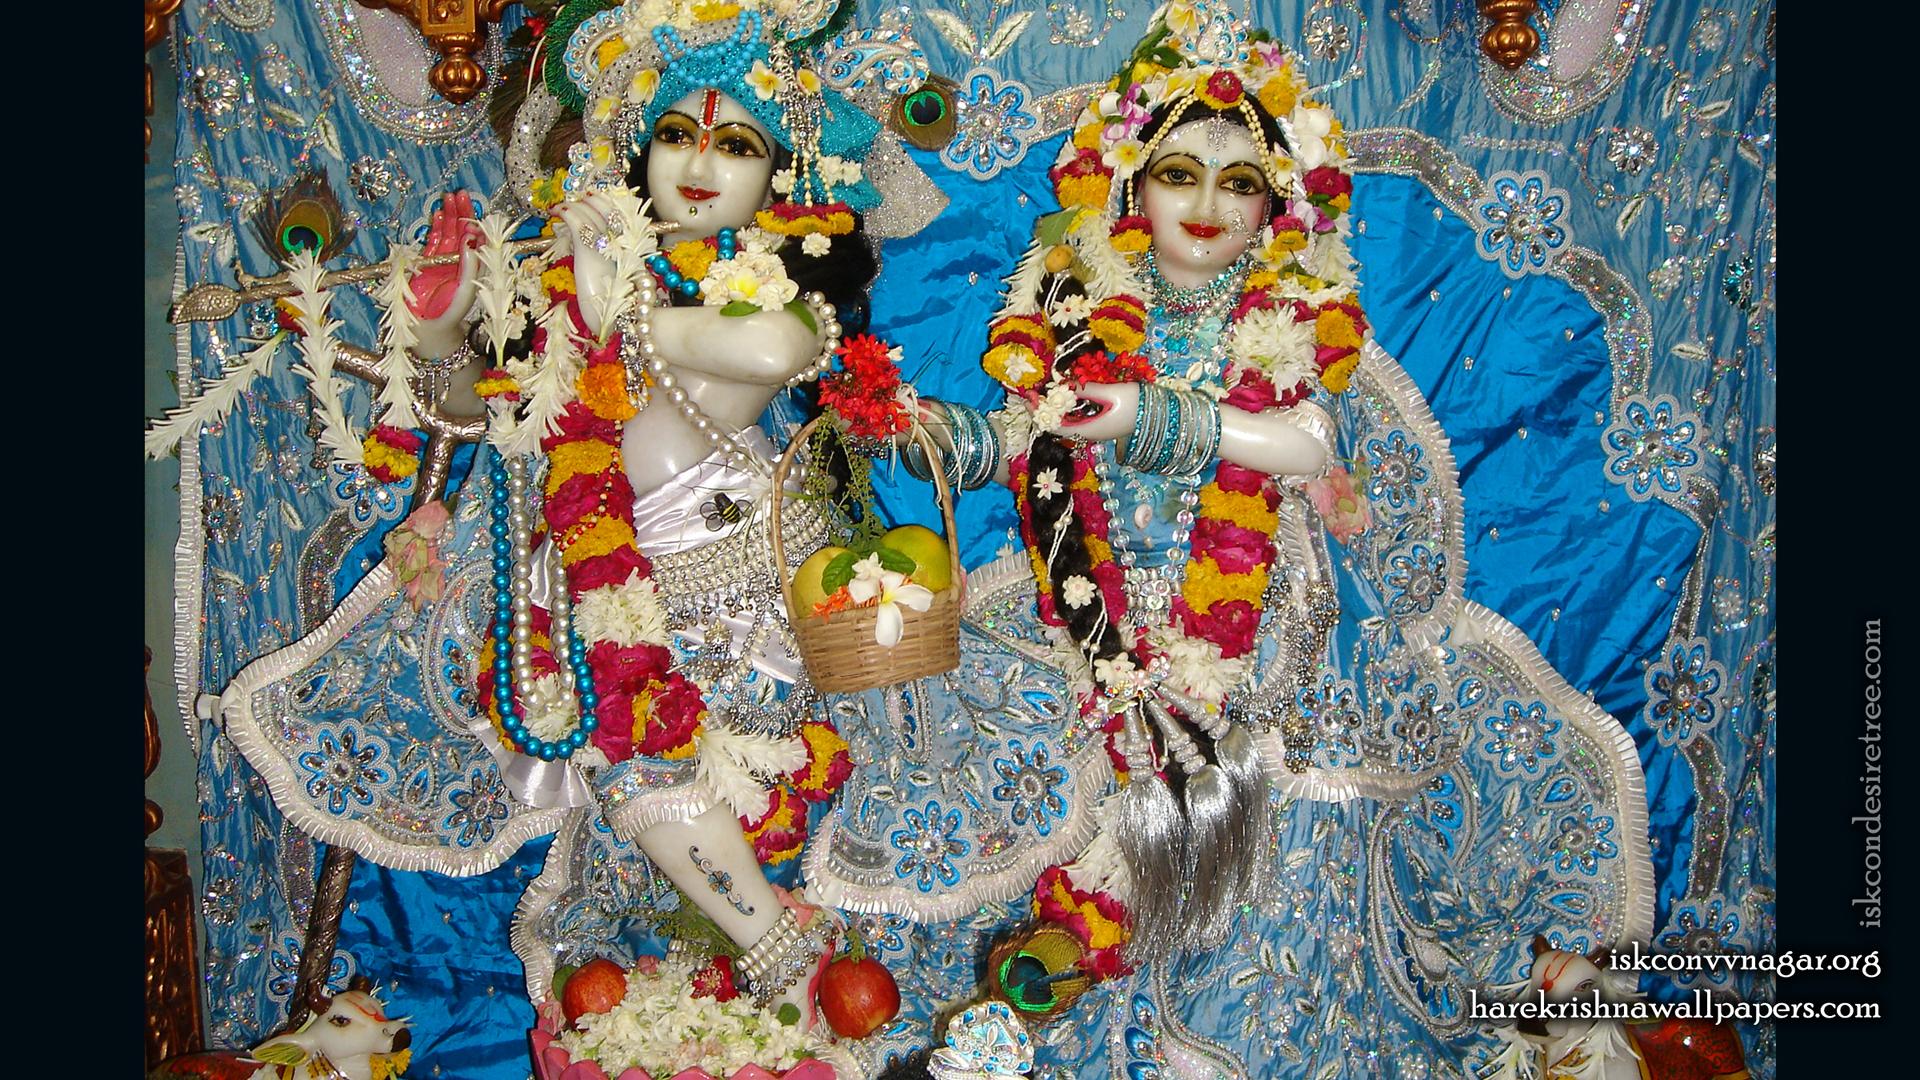 Sri Sri Radha Giridhari Wallpaper (022) Size 1920x1080 Download